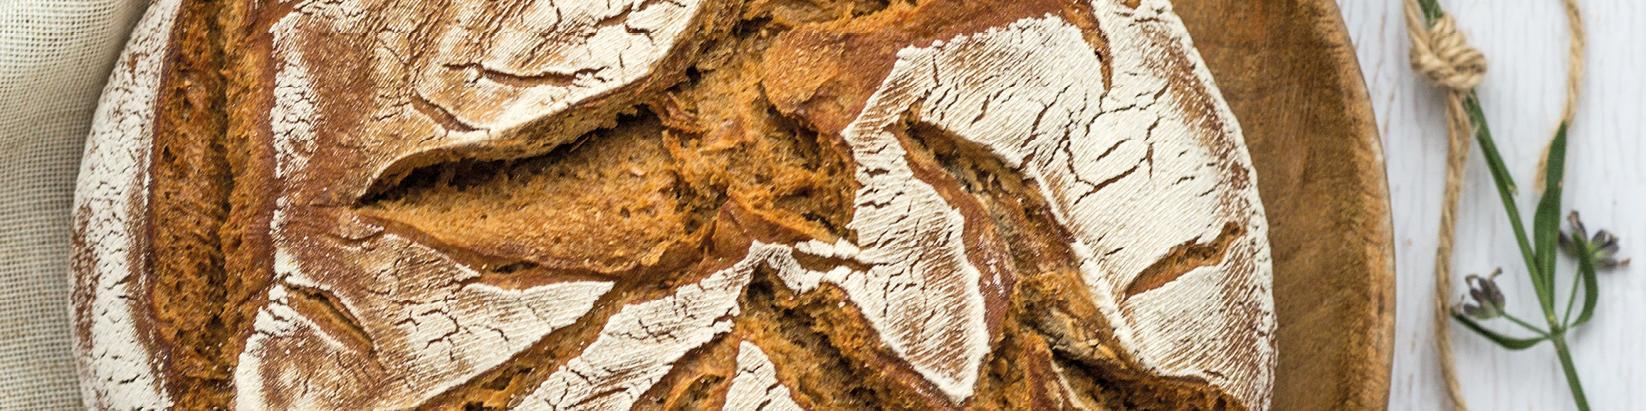 Roggenmischbrot Dinkel traditionelles Brot Geschmack, Steirer, Südback 2017